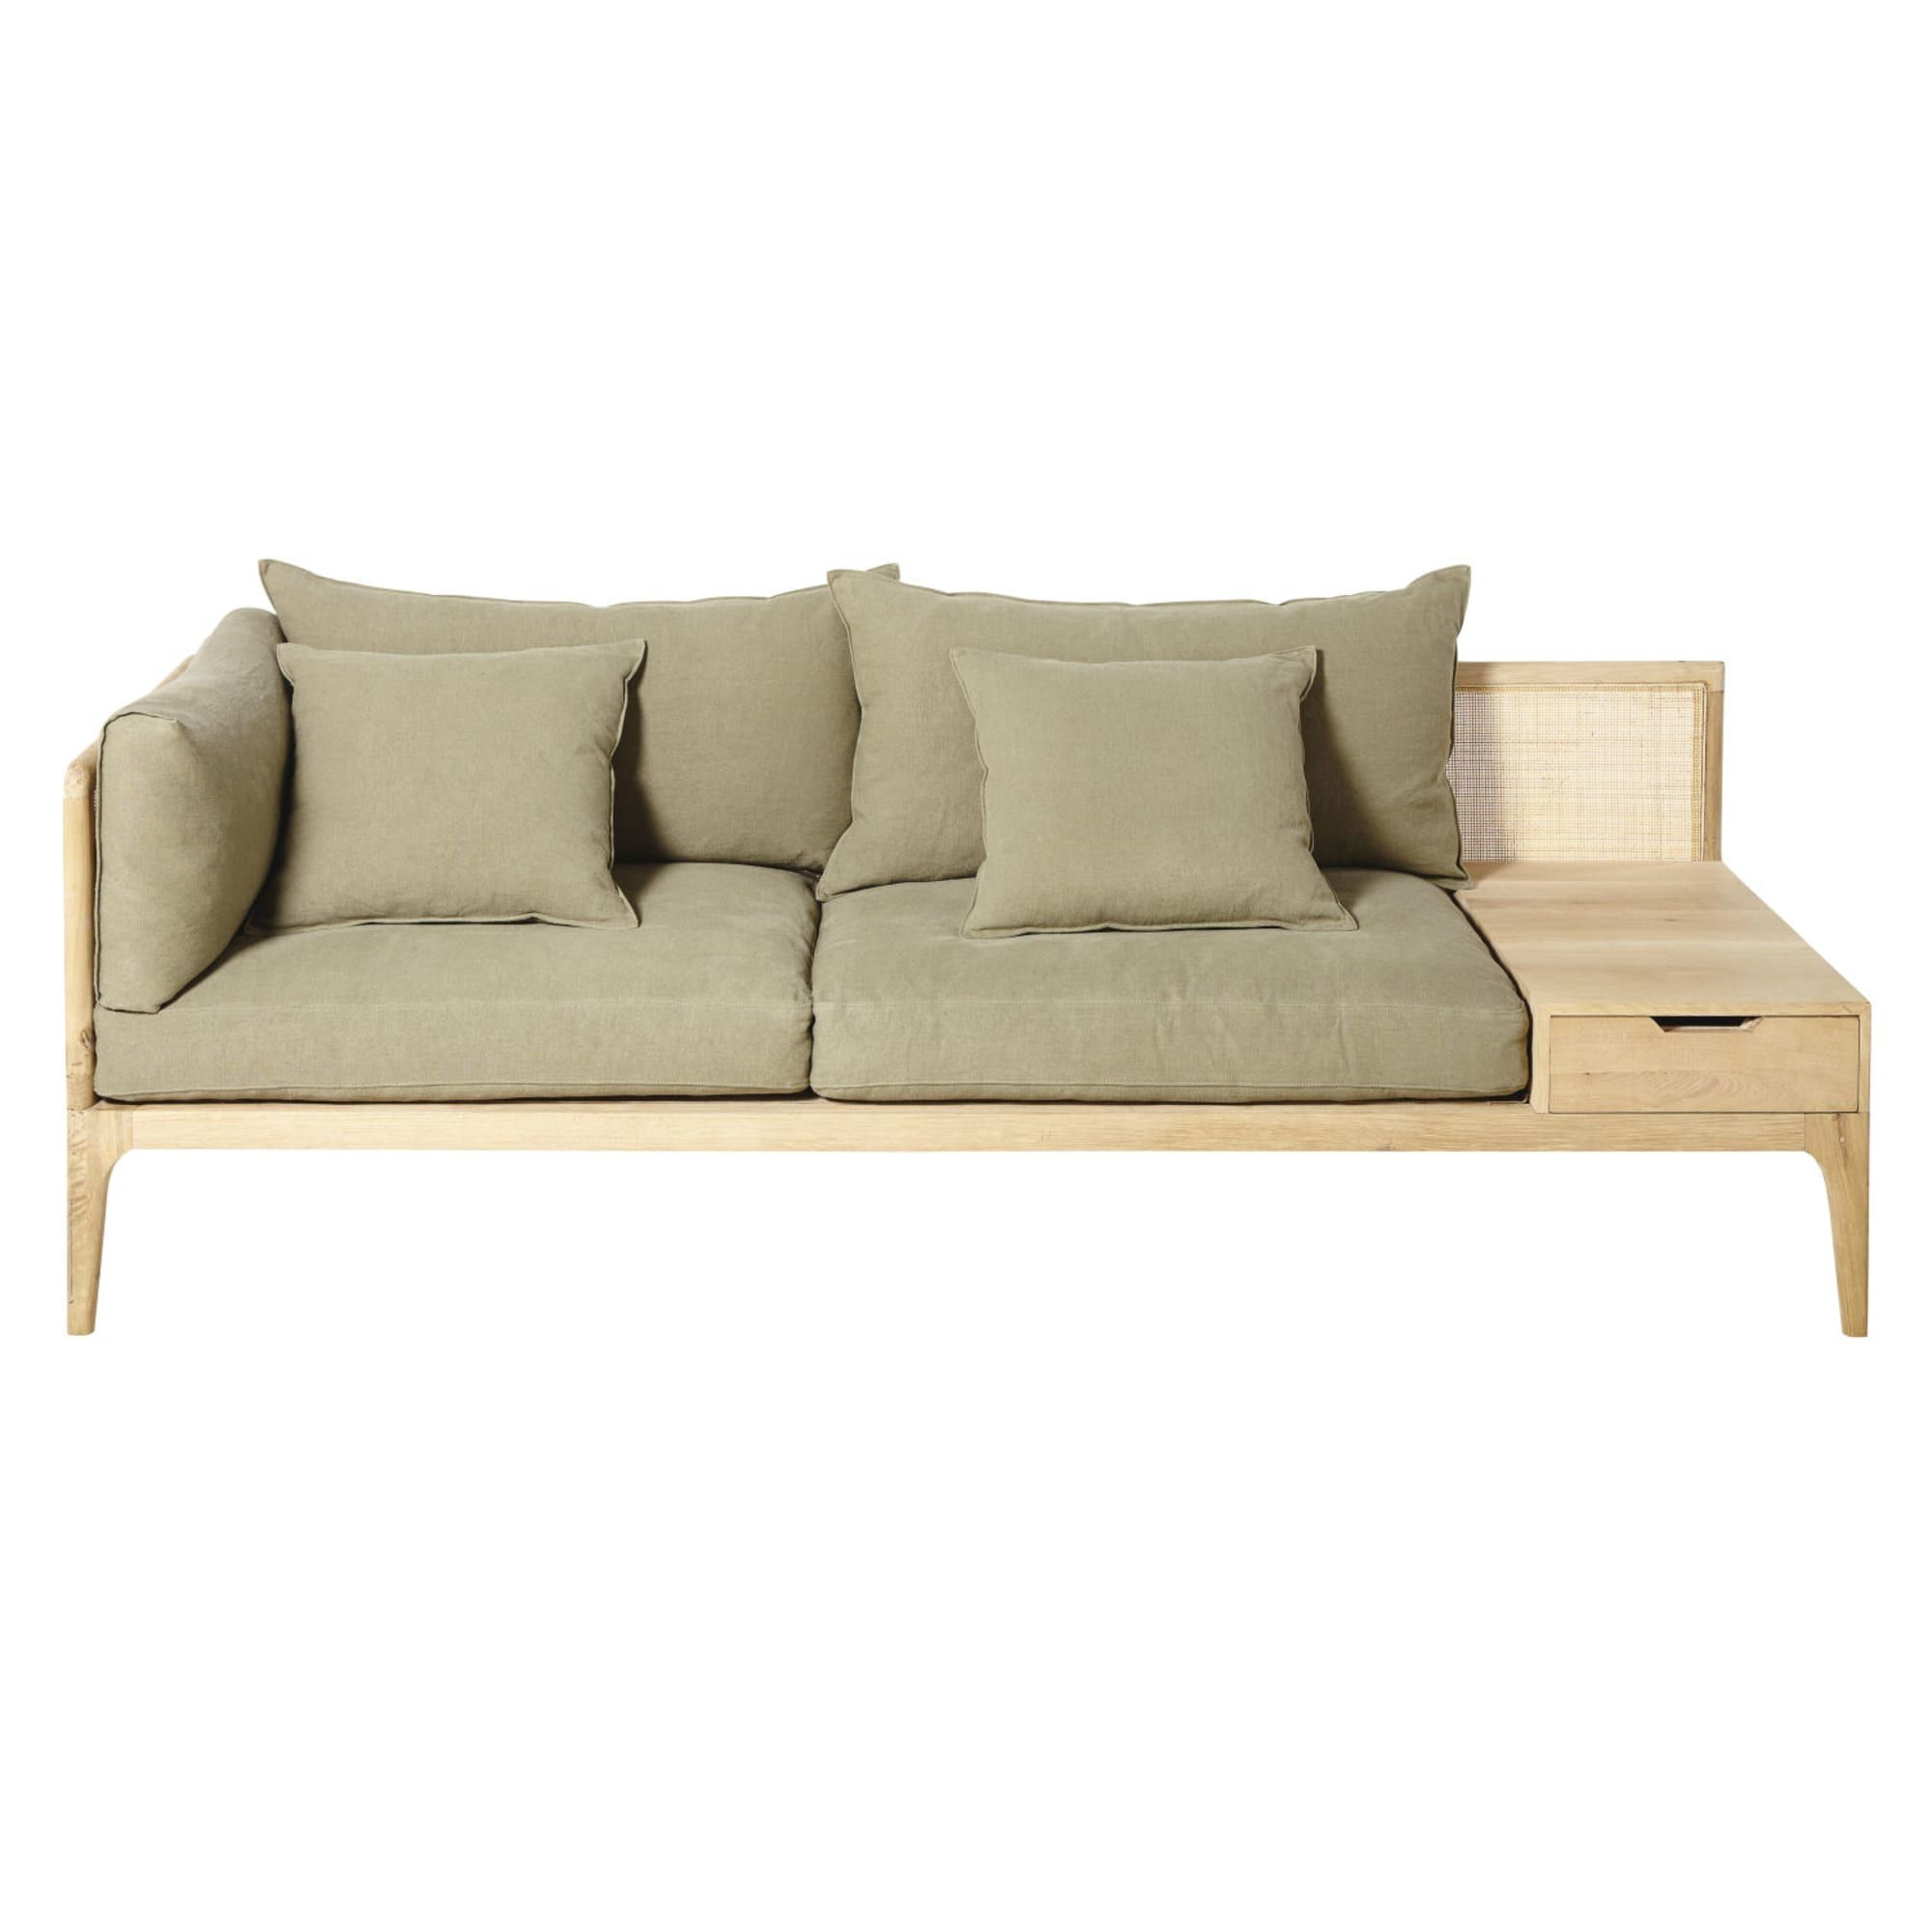 Khaki 3 Seater Sofa Delphes Maisons Du Monde Sofa 3 Seater Sofa Seater Sofa